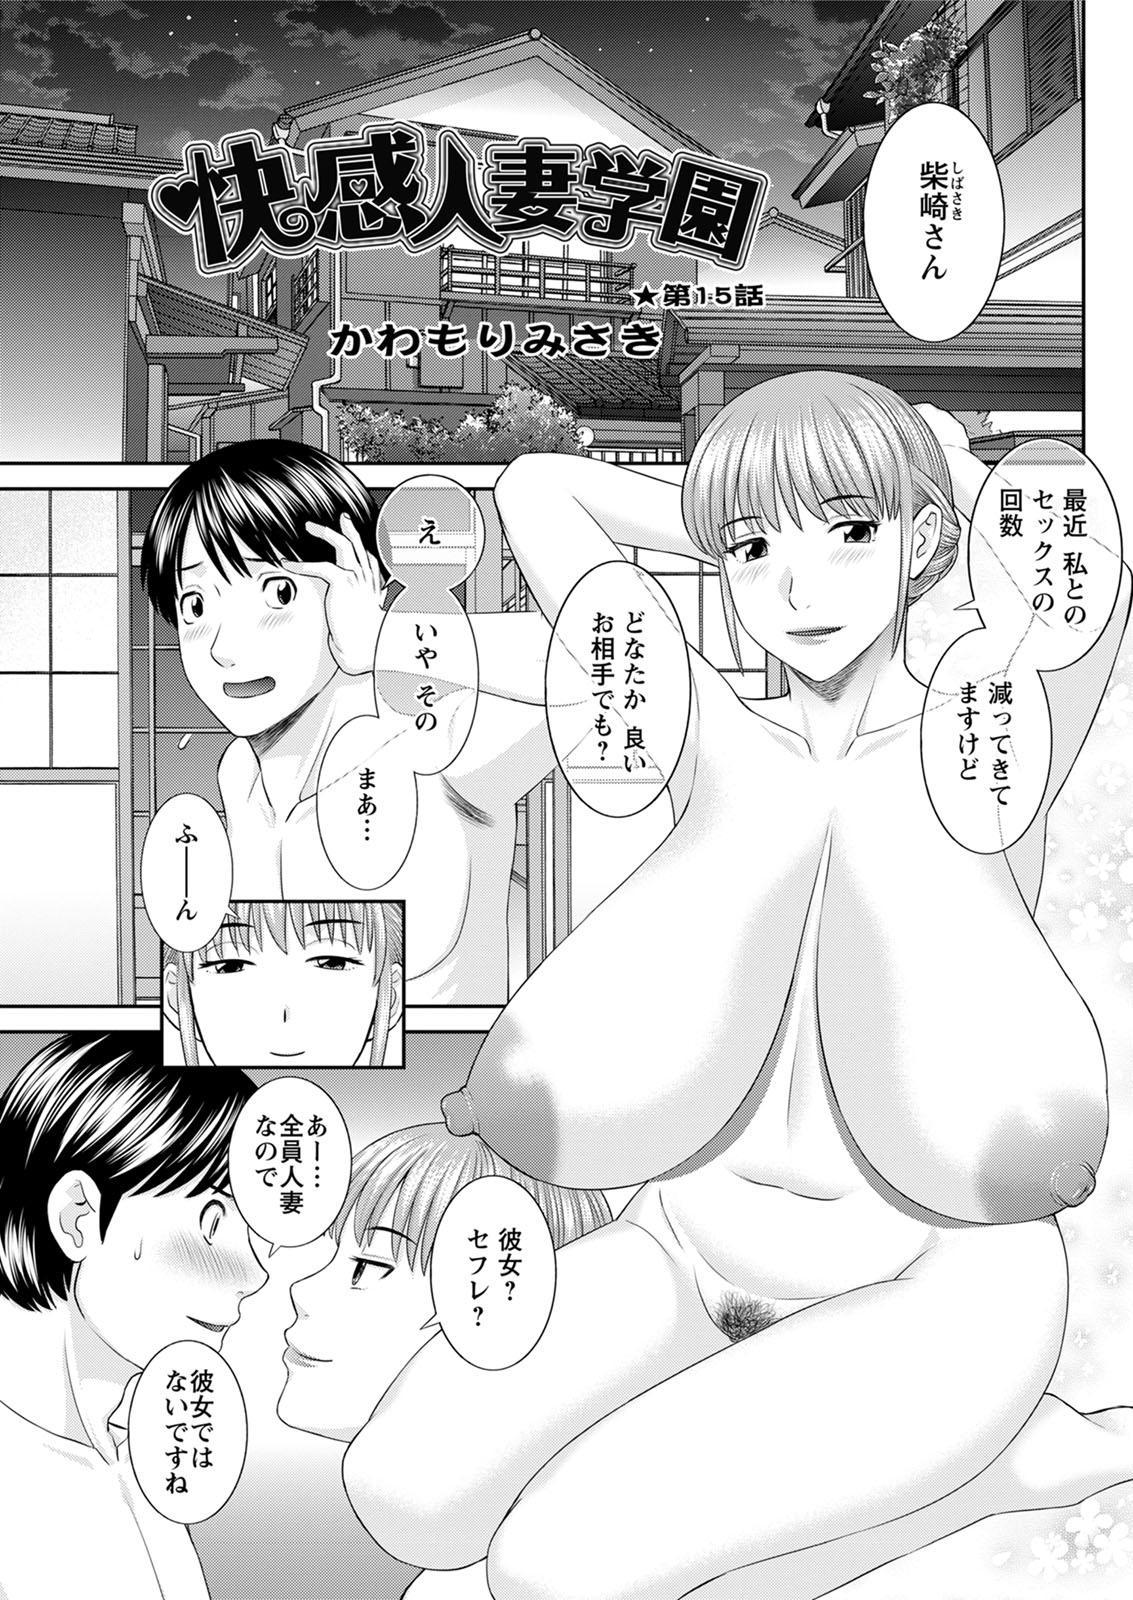 [Kawamori Misaki] Kaikan Hitotsuma Gakuen Ch. 1-6, 8-20 [Digital] 239